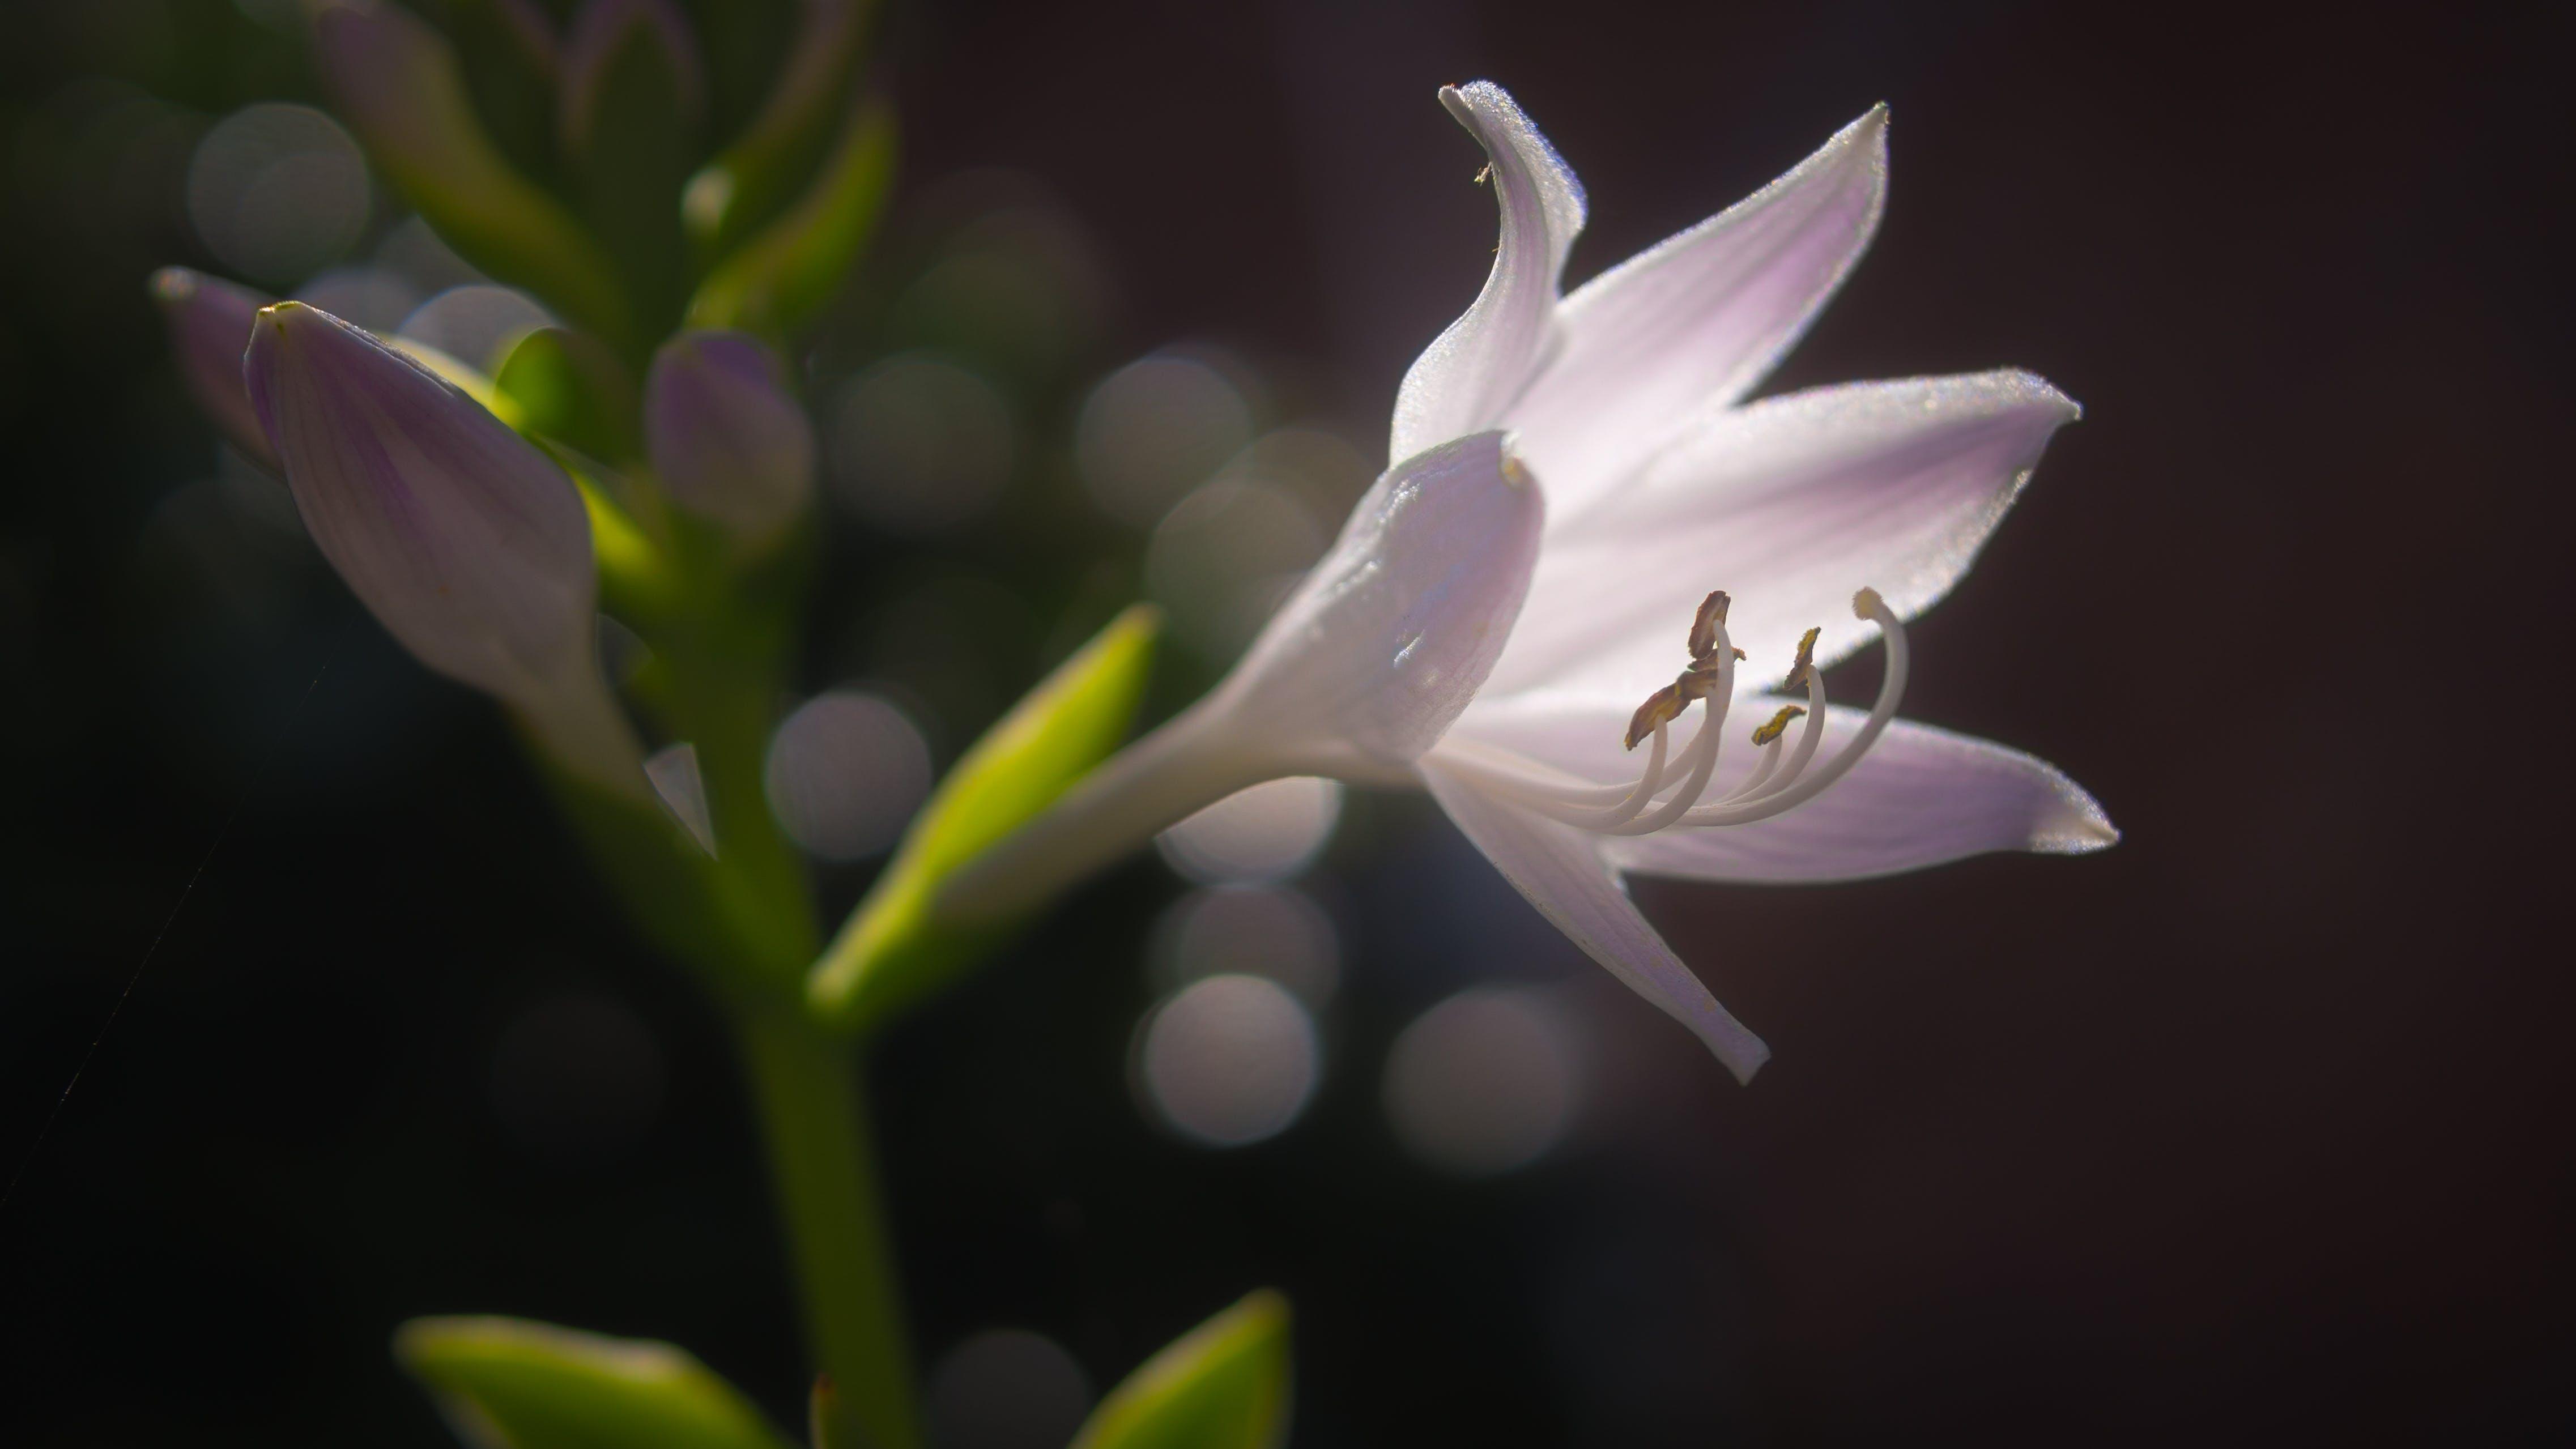 Pink Flower on Shallow Focus Lens